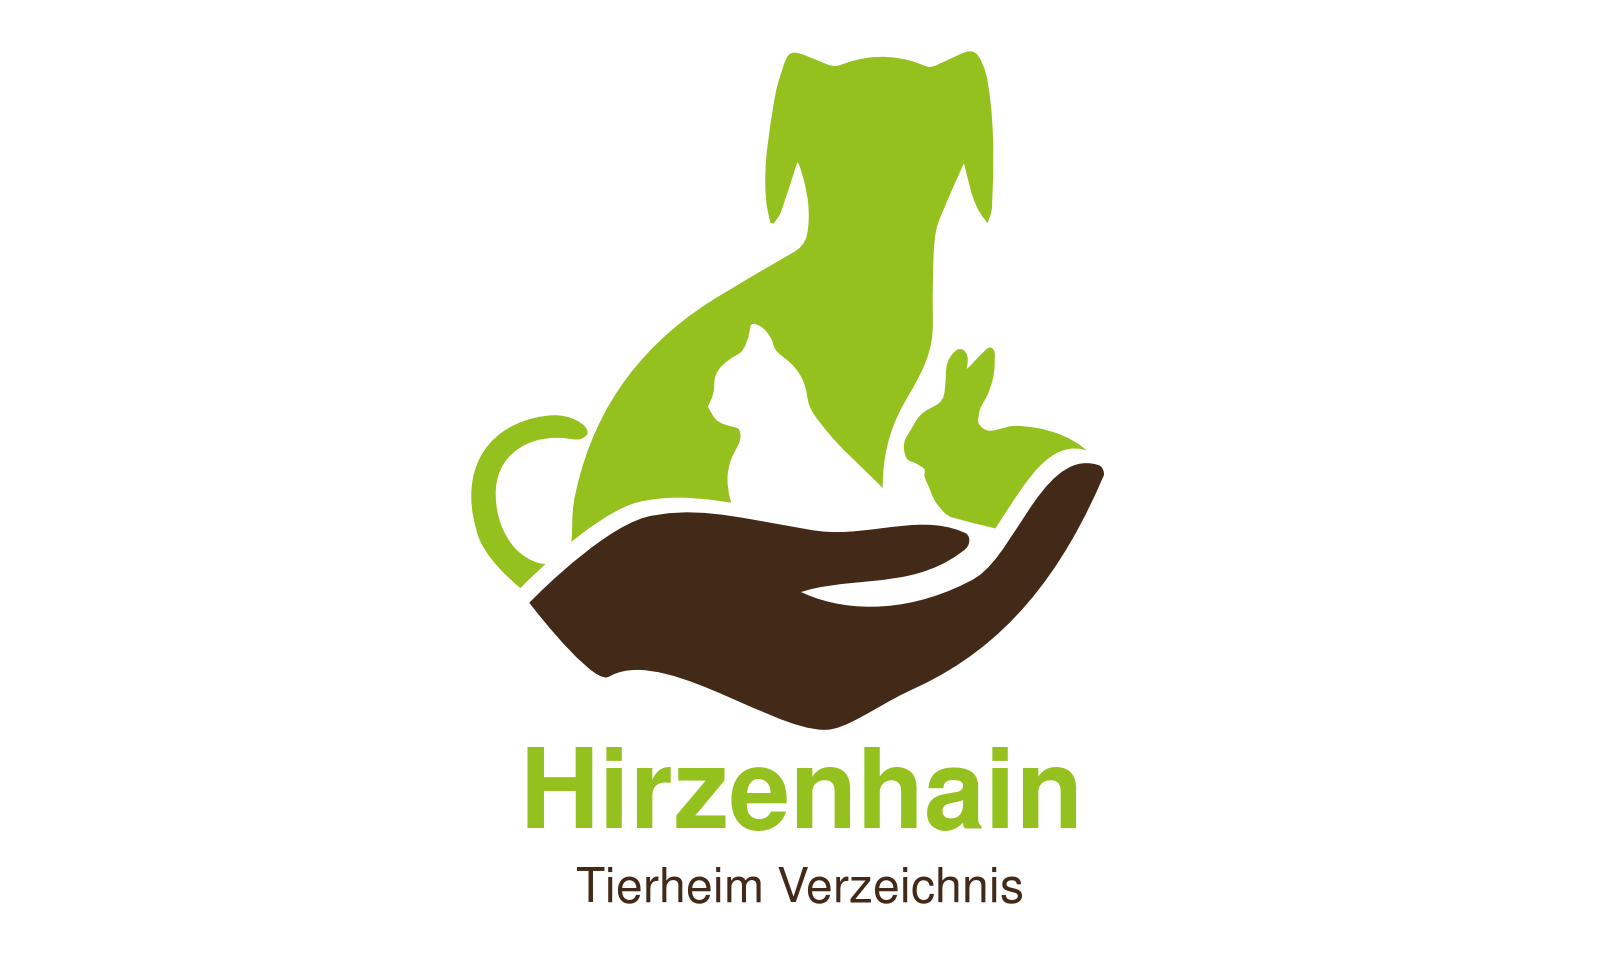 Tierheim Hirzenhain